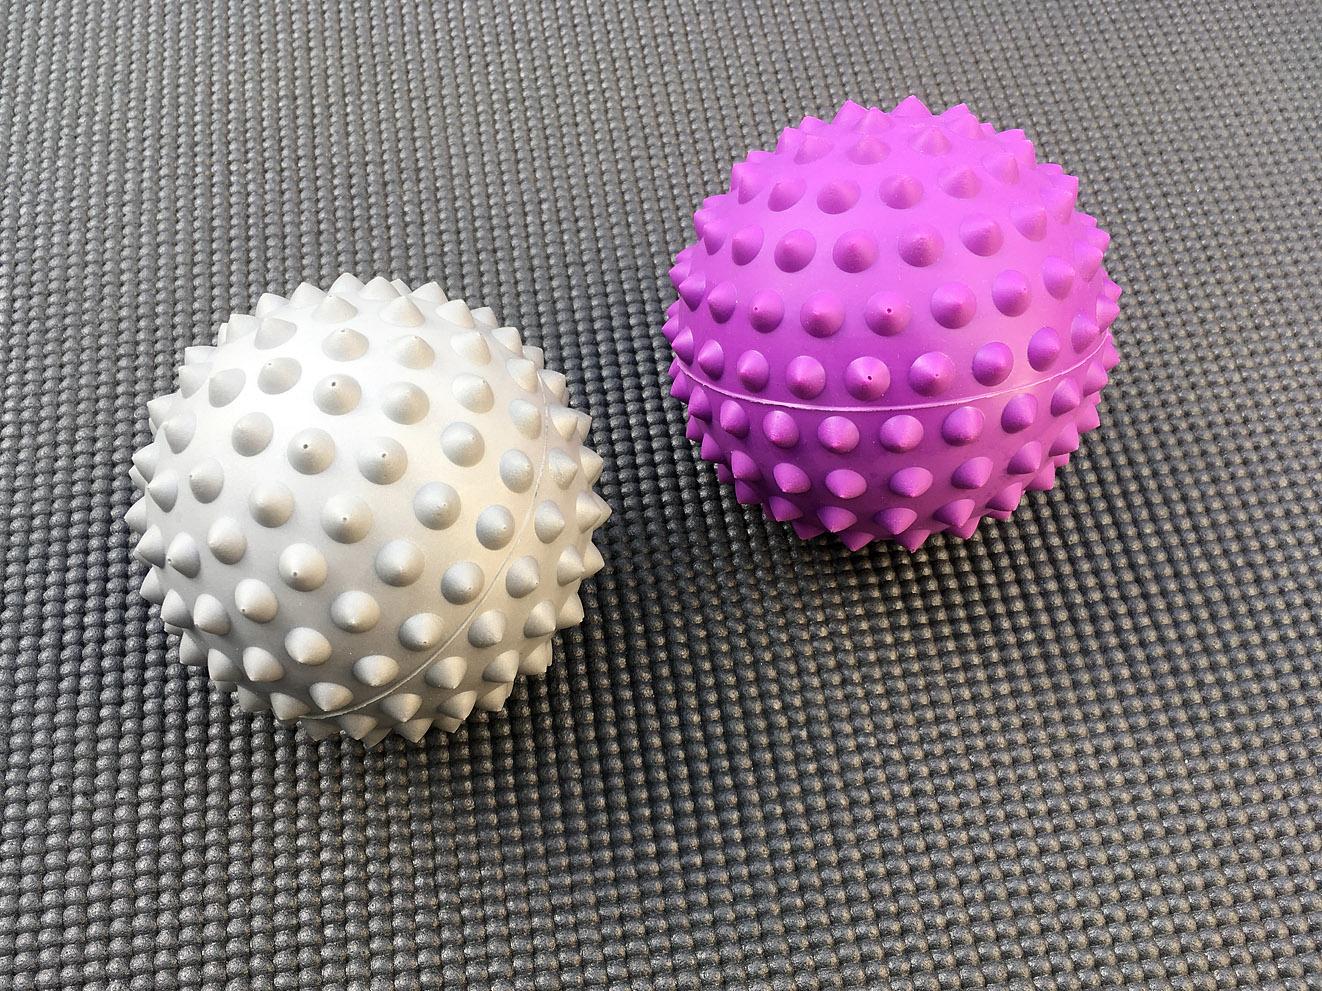 Trigger Point Pilates balls